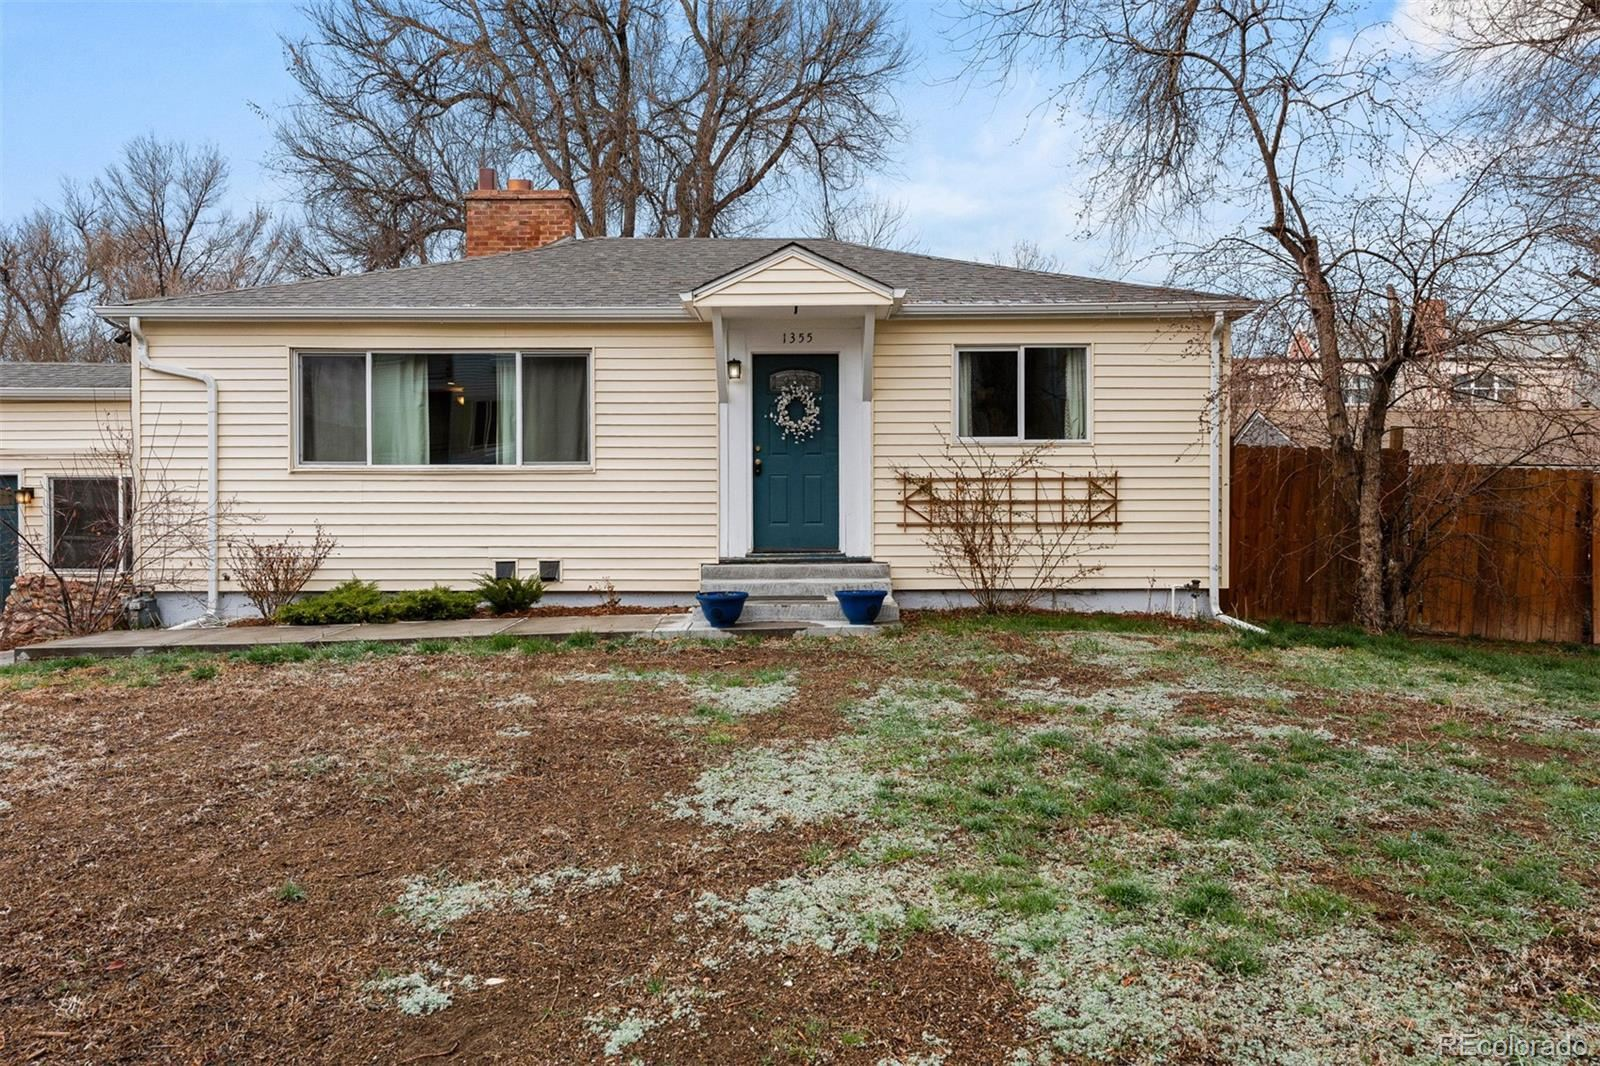 1355 Allison Street, Lakewood, CO 80214 - #: 3405492